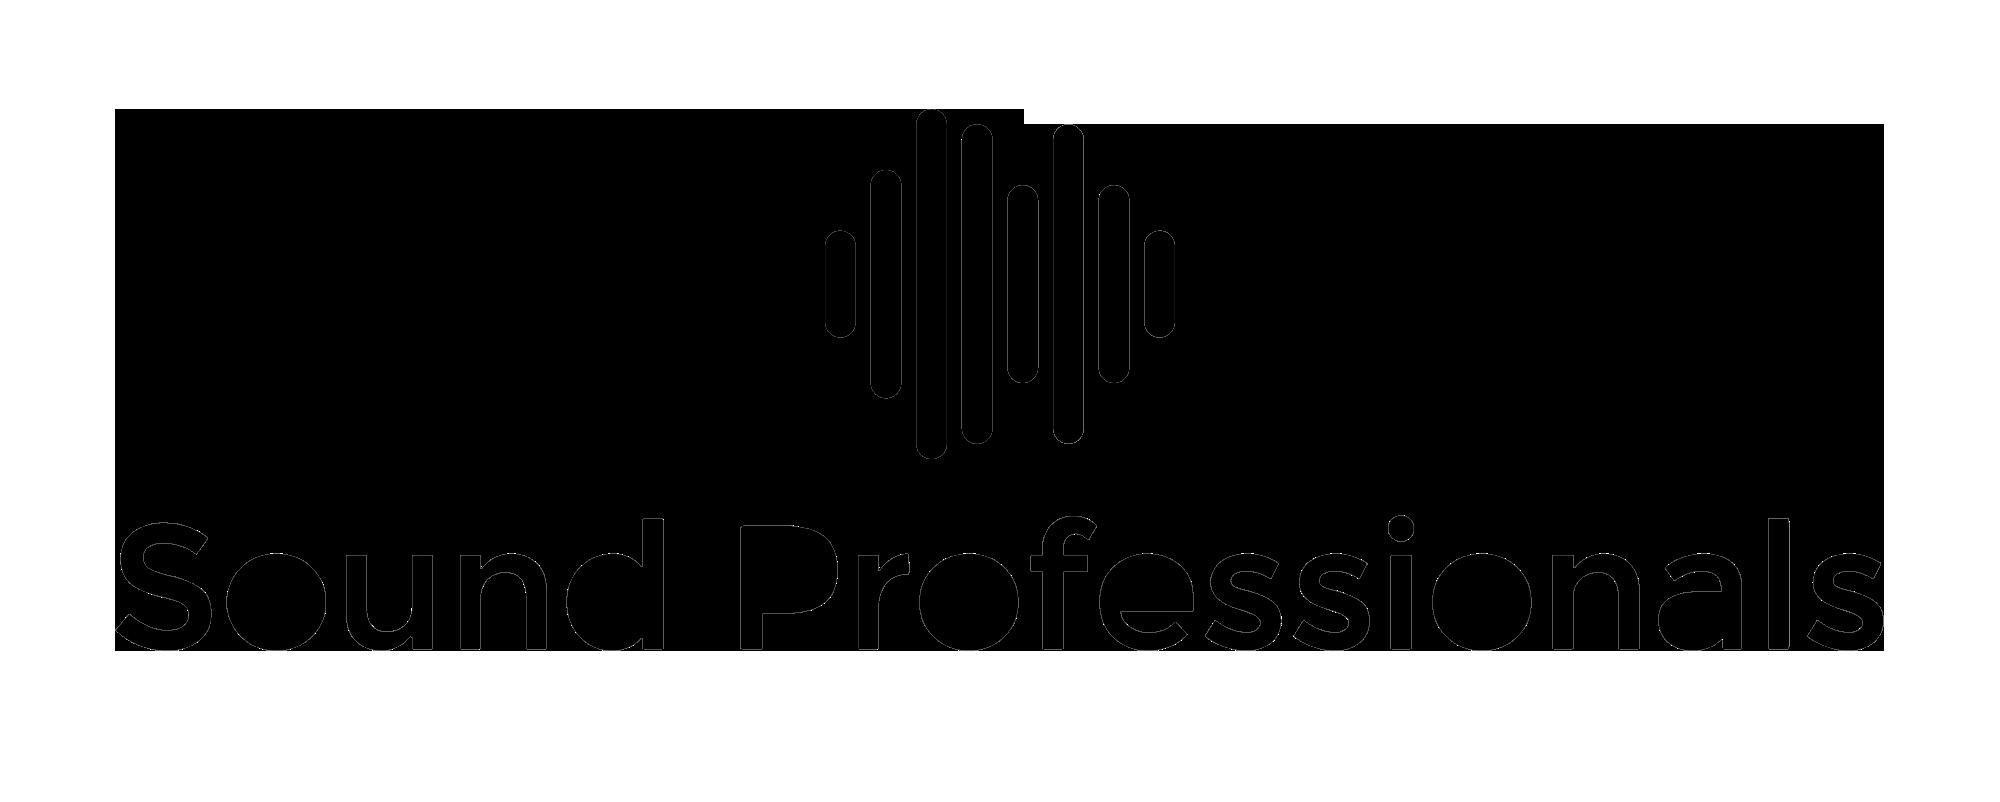 Sound Professionals-logo-black.png